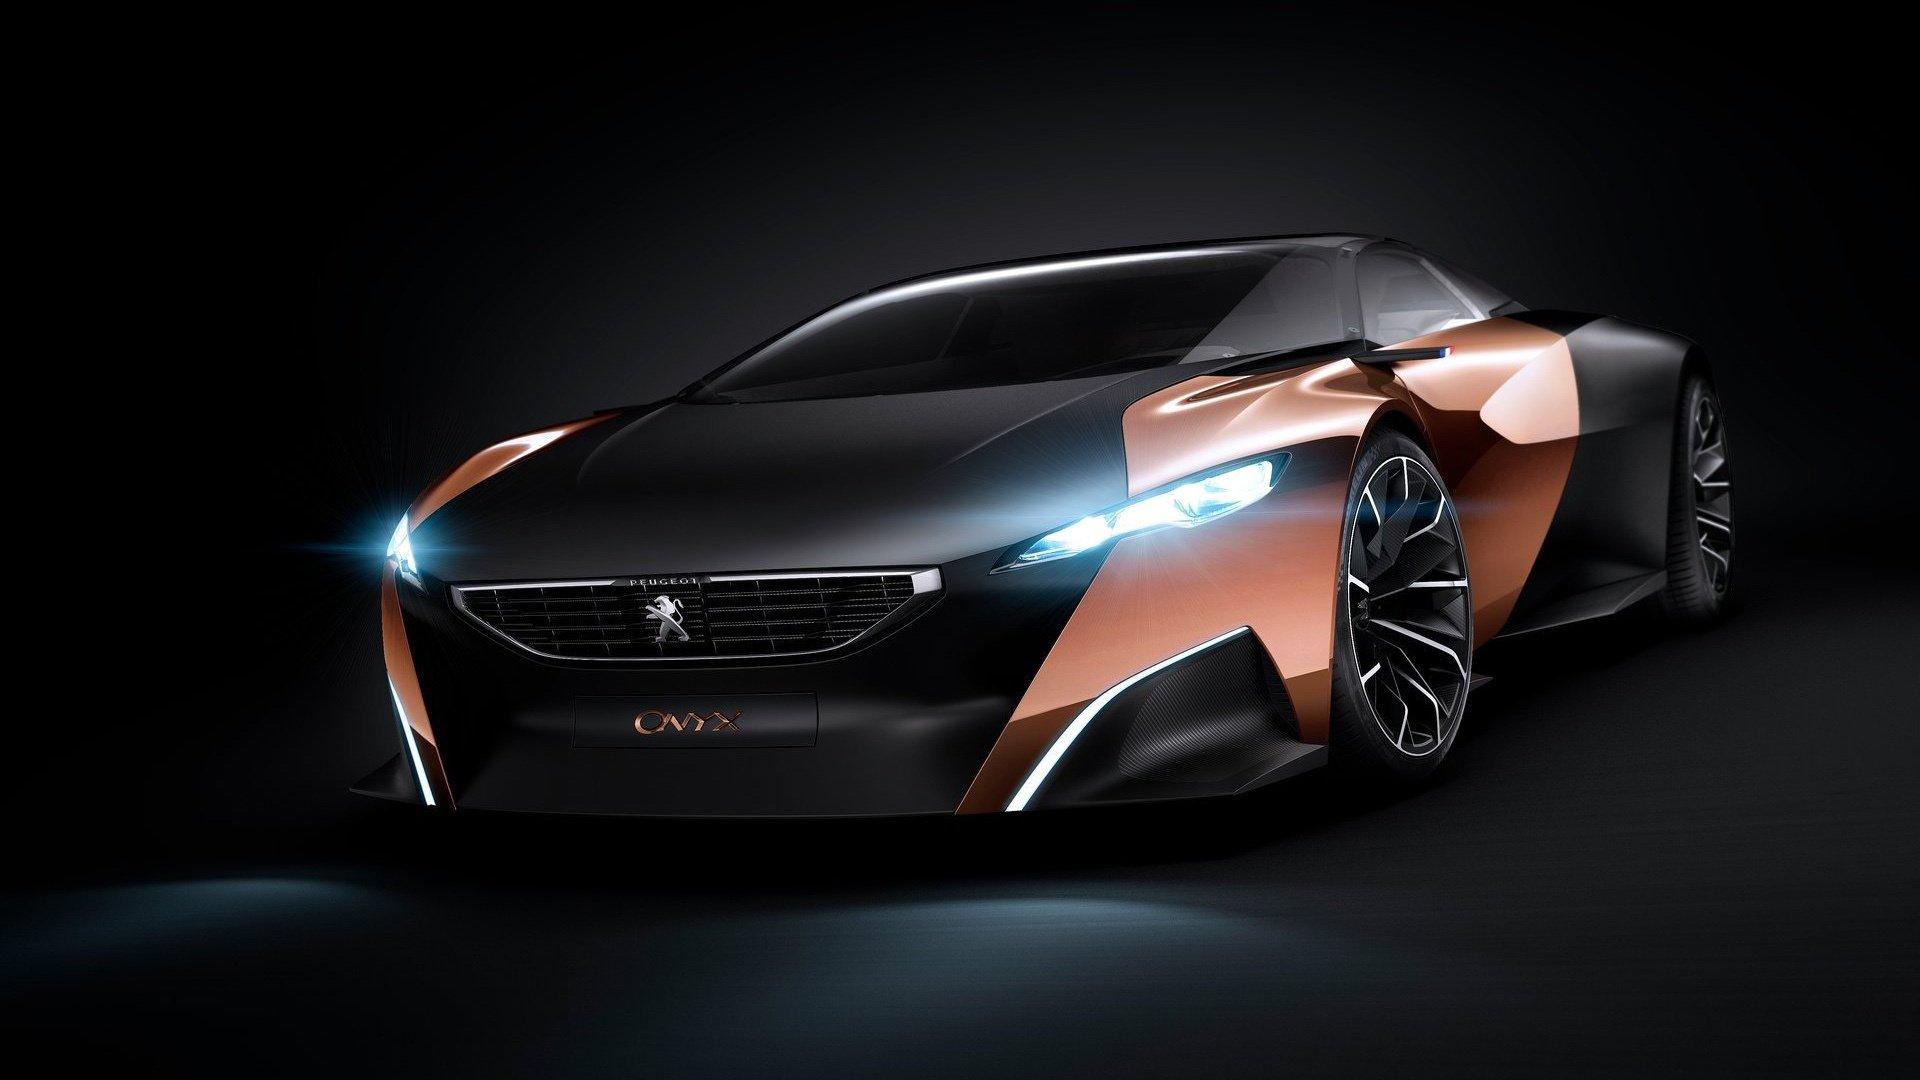 366 Concept Car HD Wallpapers